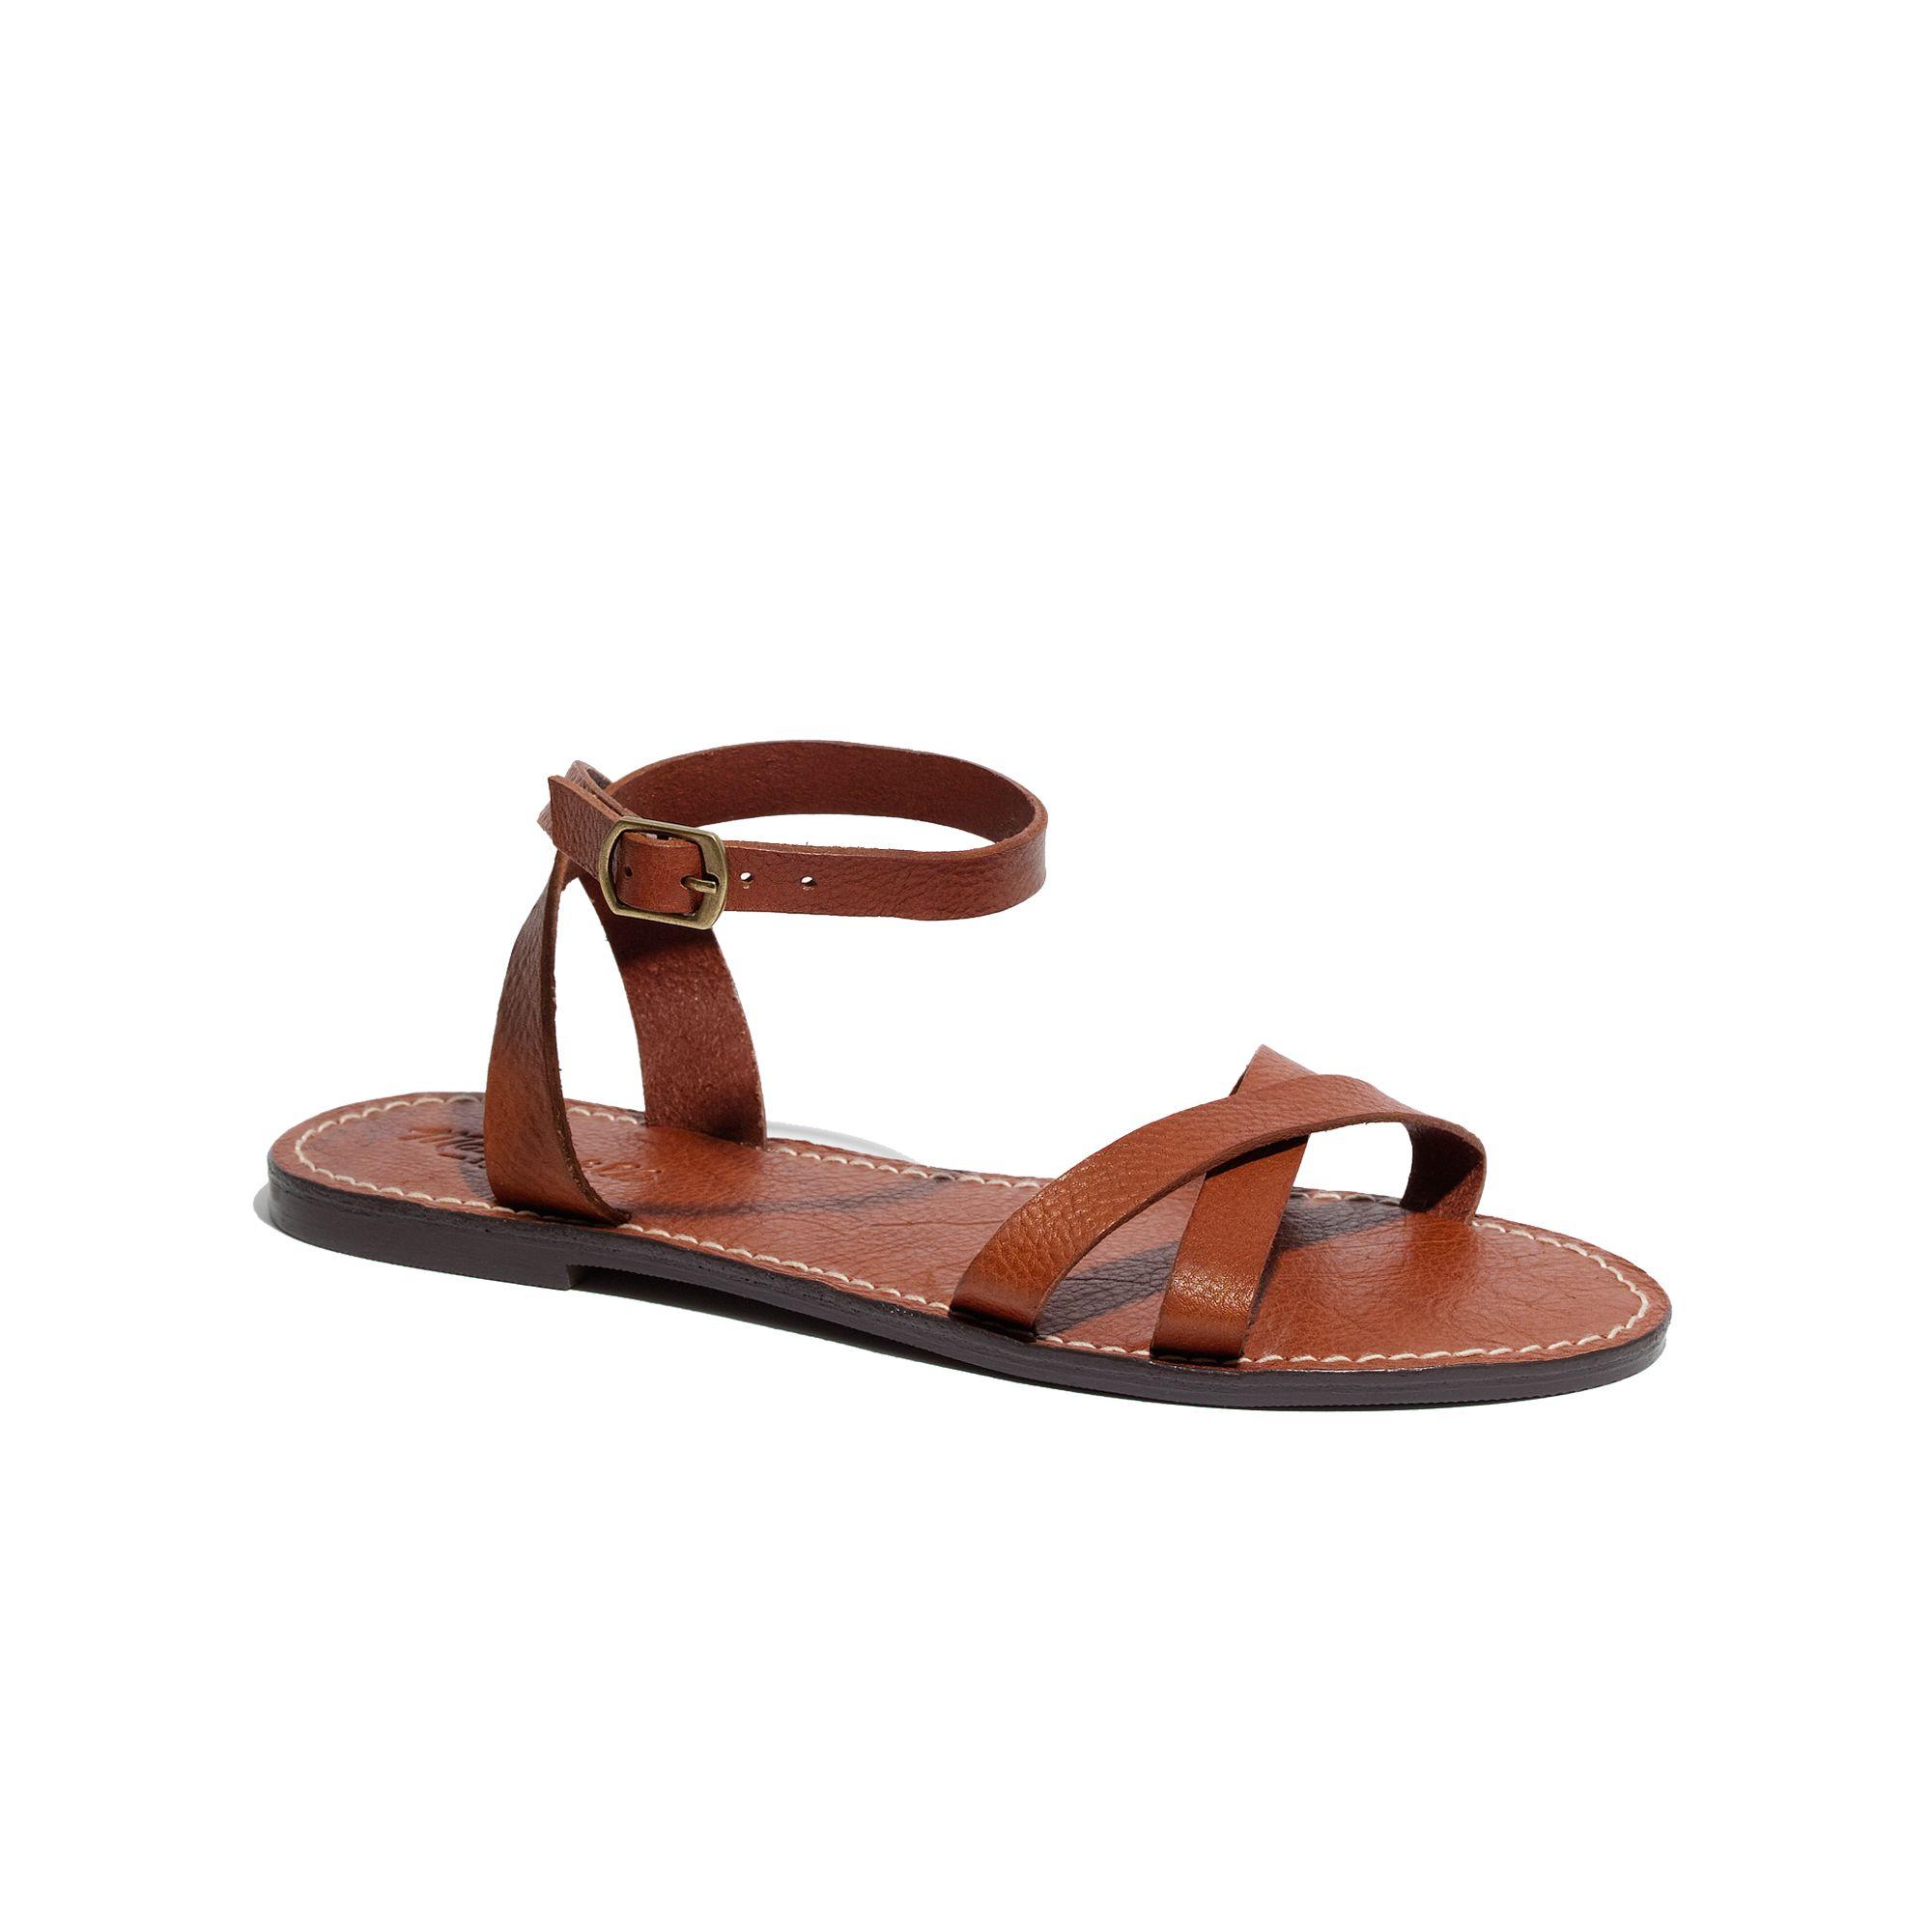 5a08a85711fc Lyst - Madewell The Crisscross Boardwalk Sandal in Brown